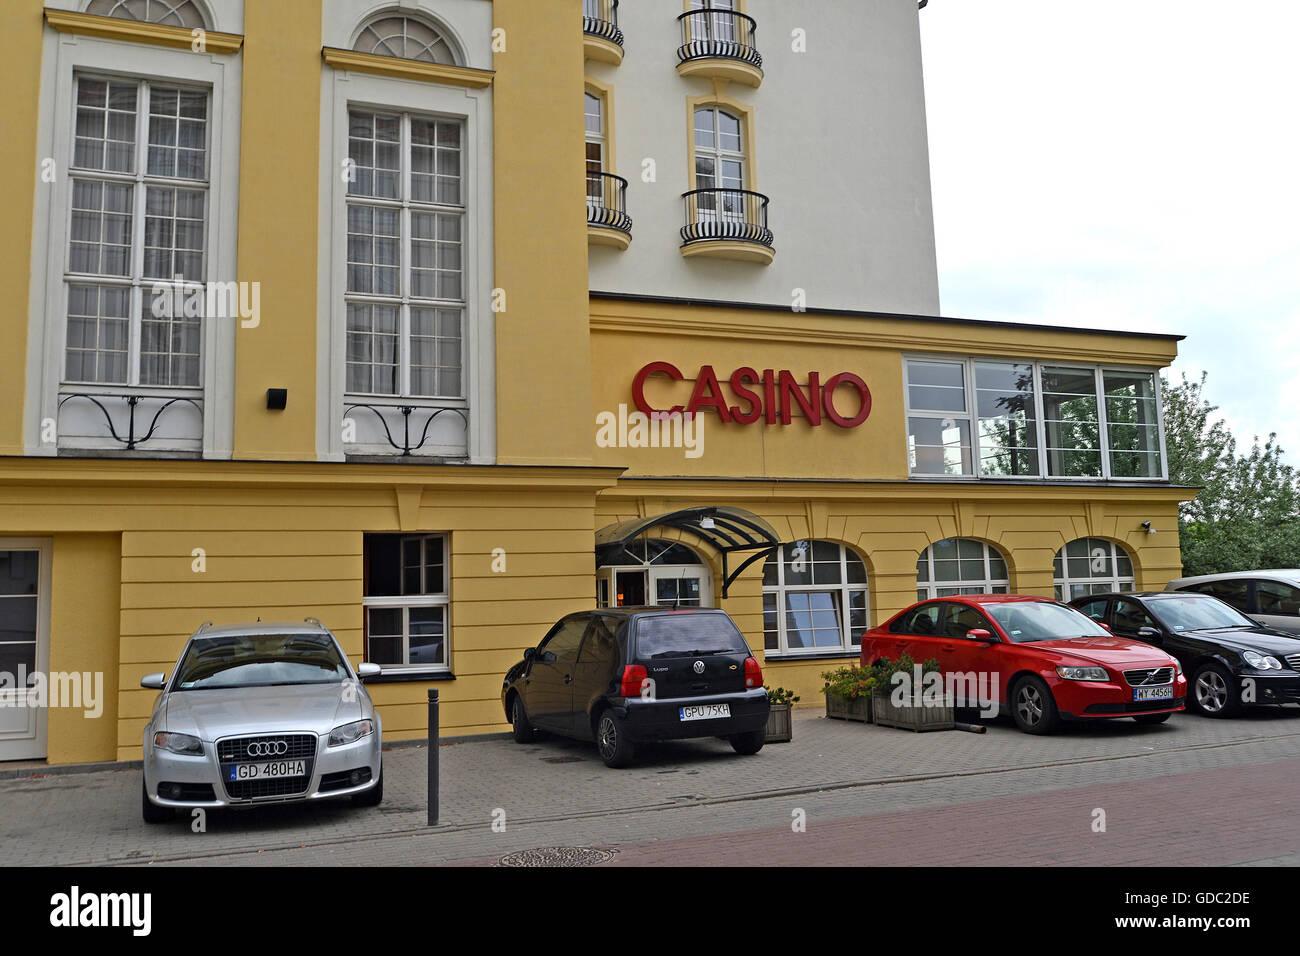 Cafe casino sister casinos